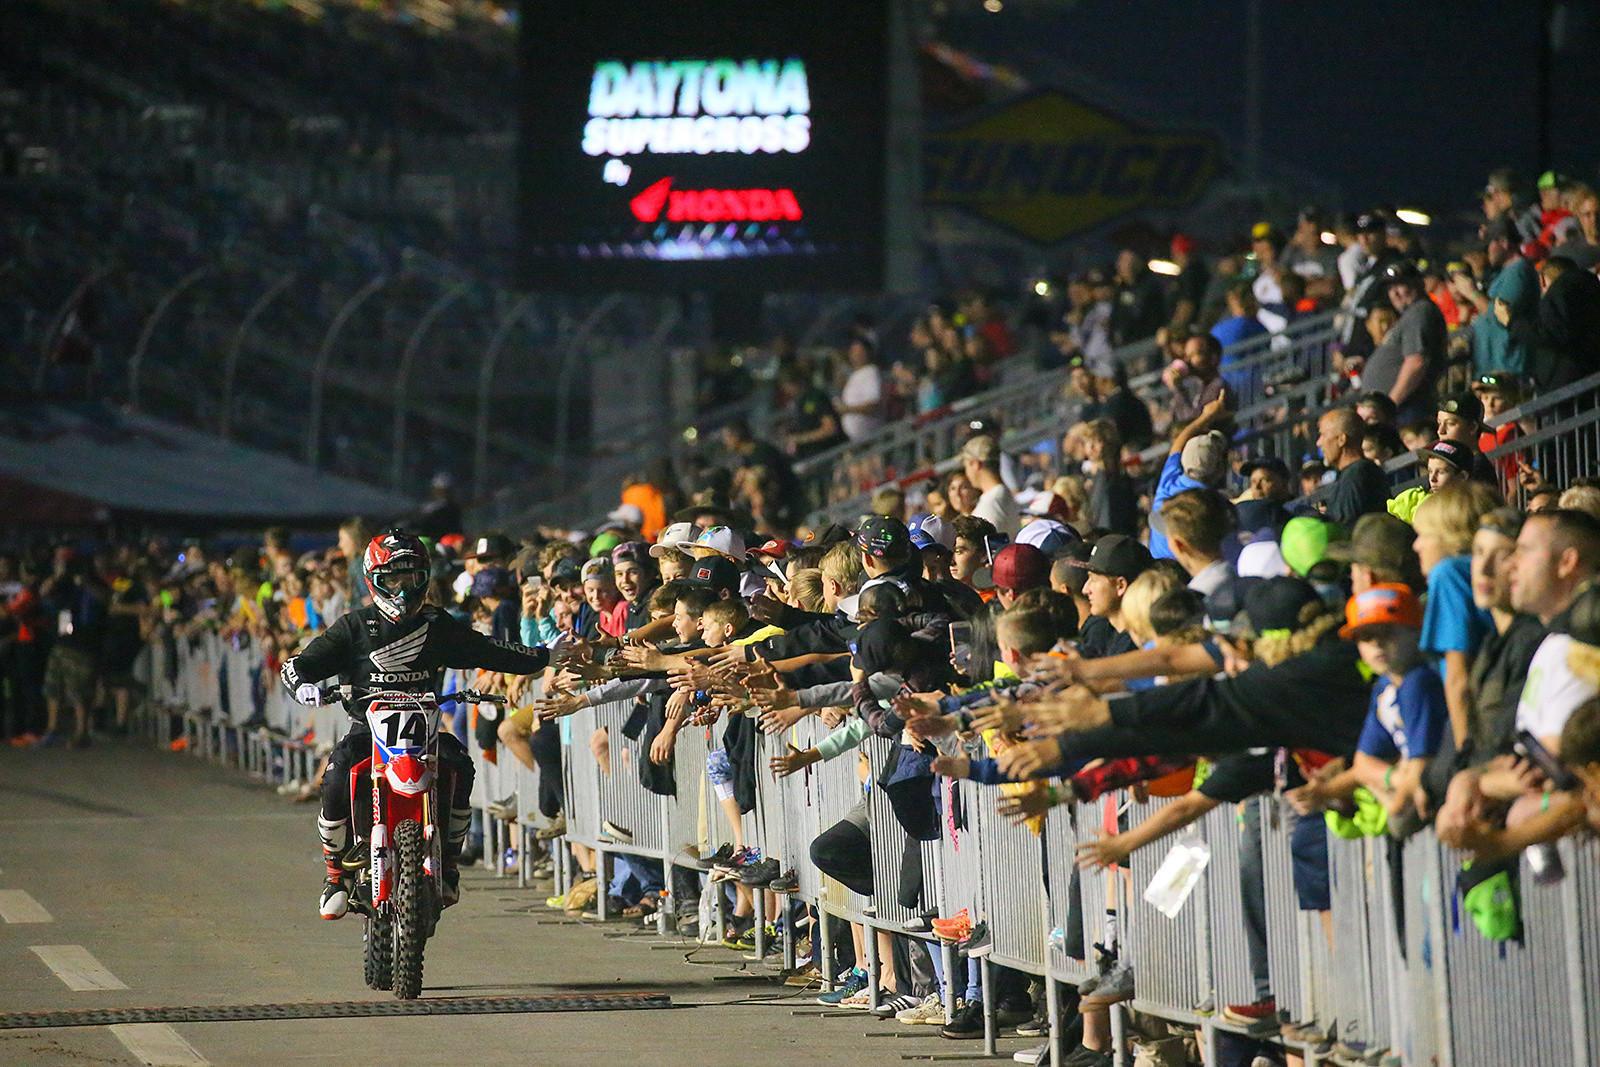 2017 Daytona Supercross